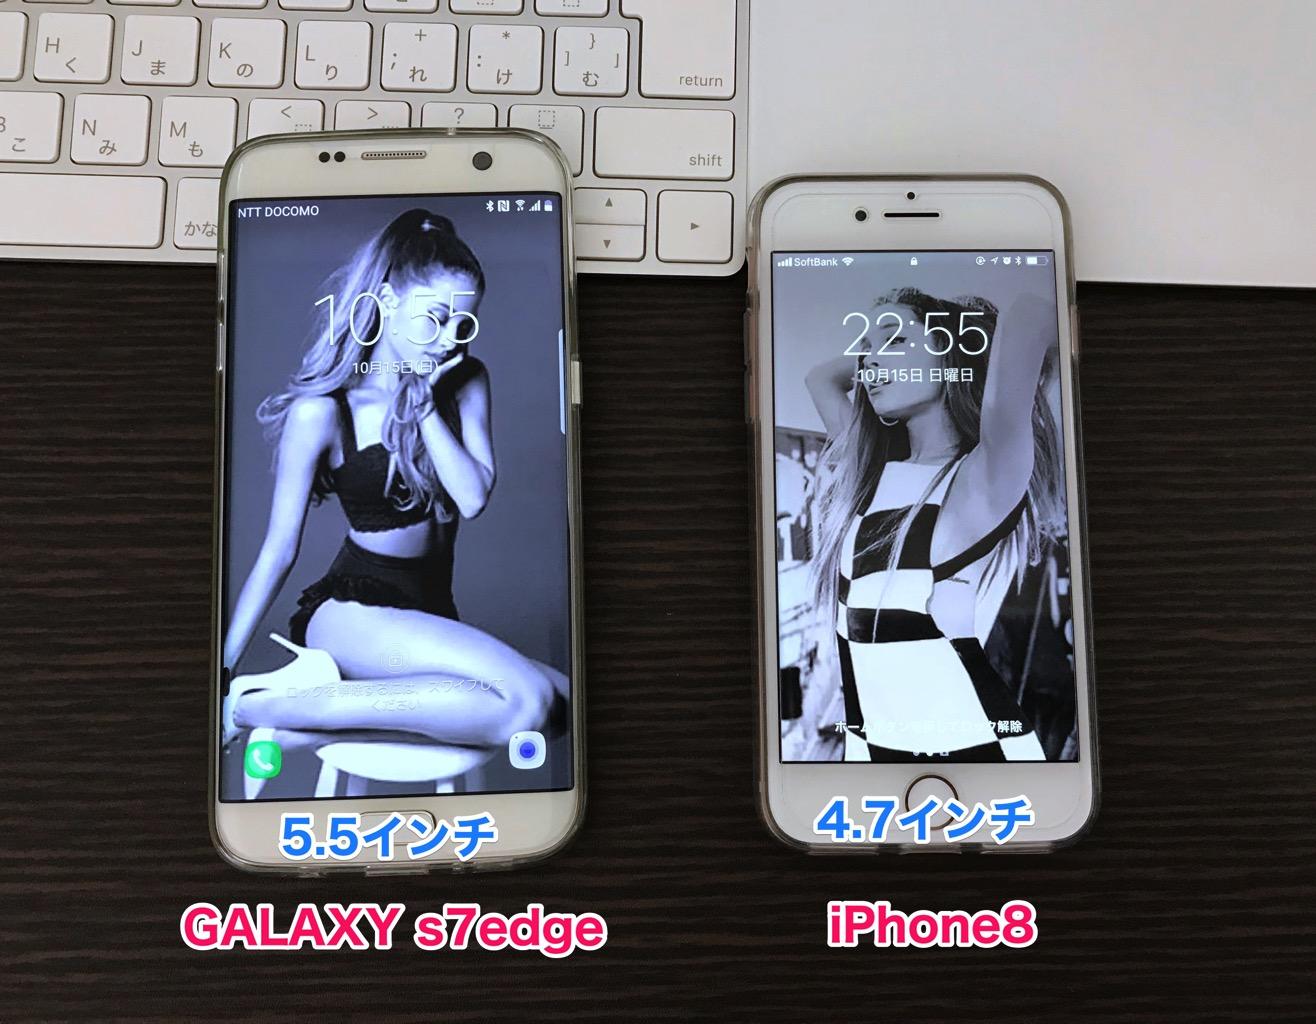 GALAXYとiPhoneの比較